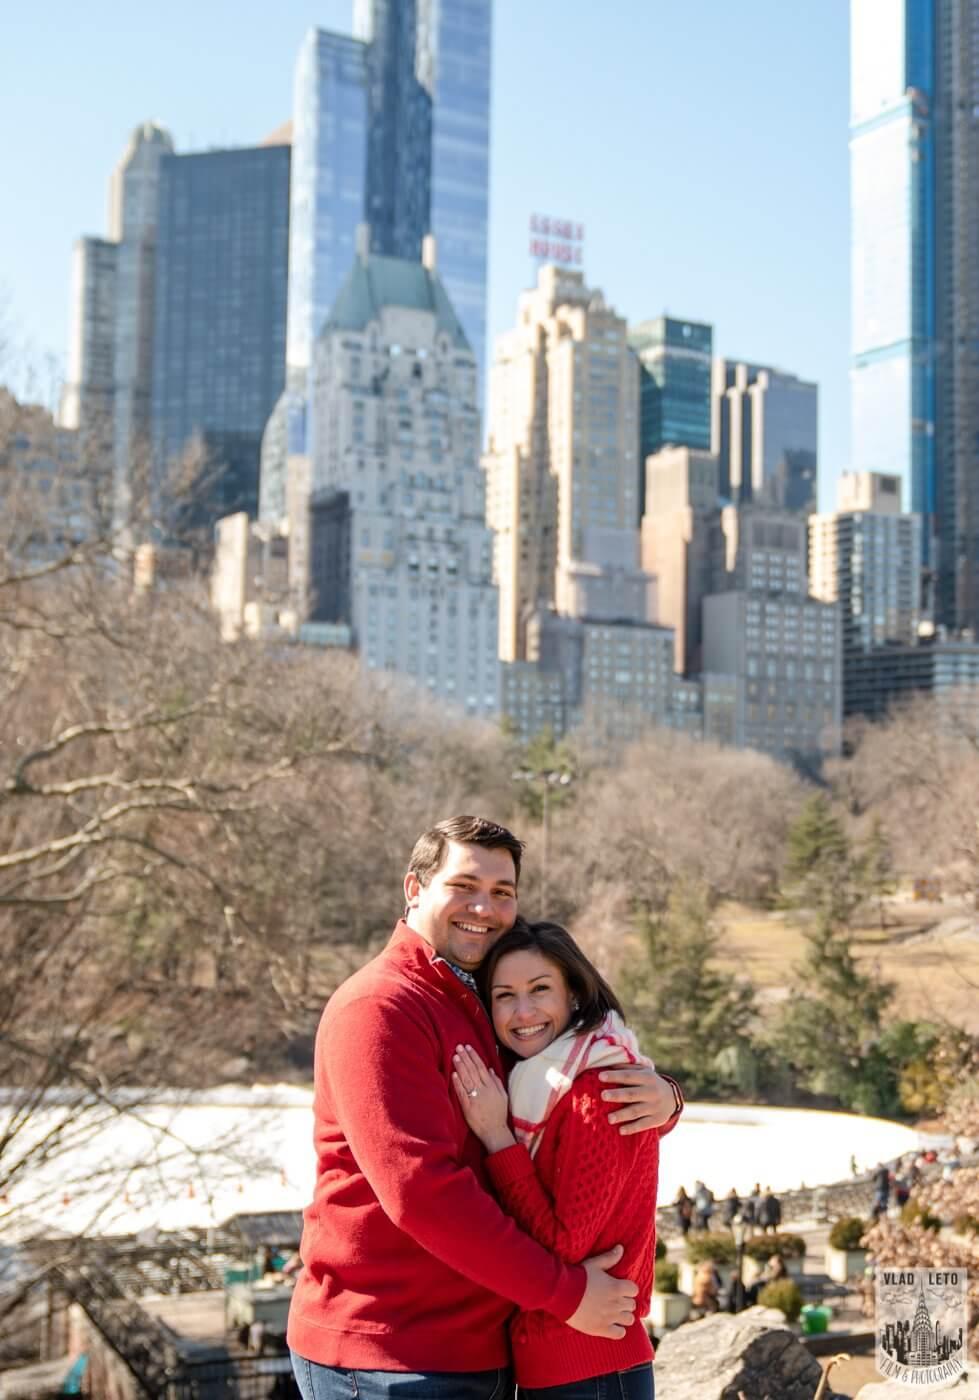 Photo 7 Gapstow bridge Marriage proposal in Central Park | VladLeto